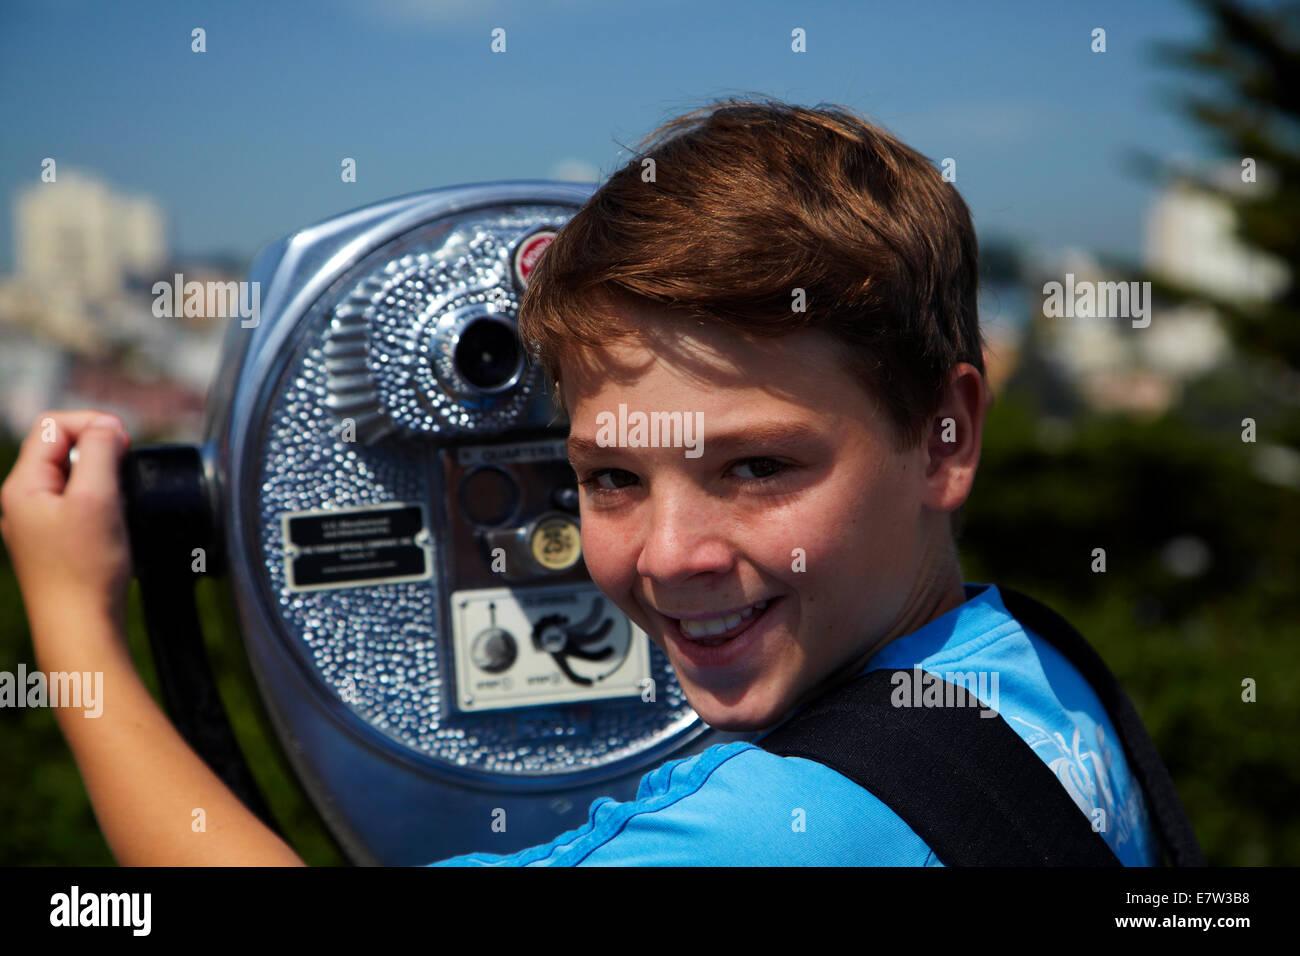 Boy using coin-operated binoculars, Telegraph Hill, San Francisco, California, USA - Stock Image